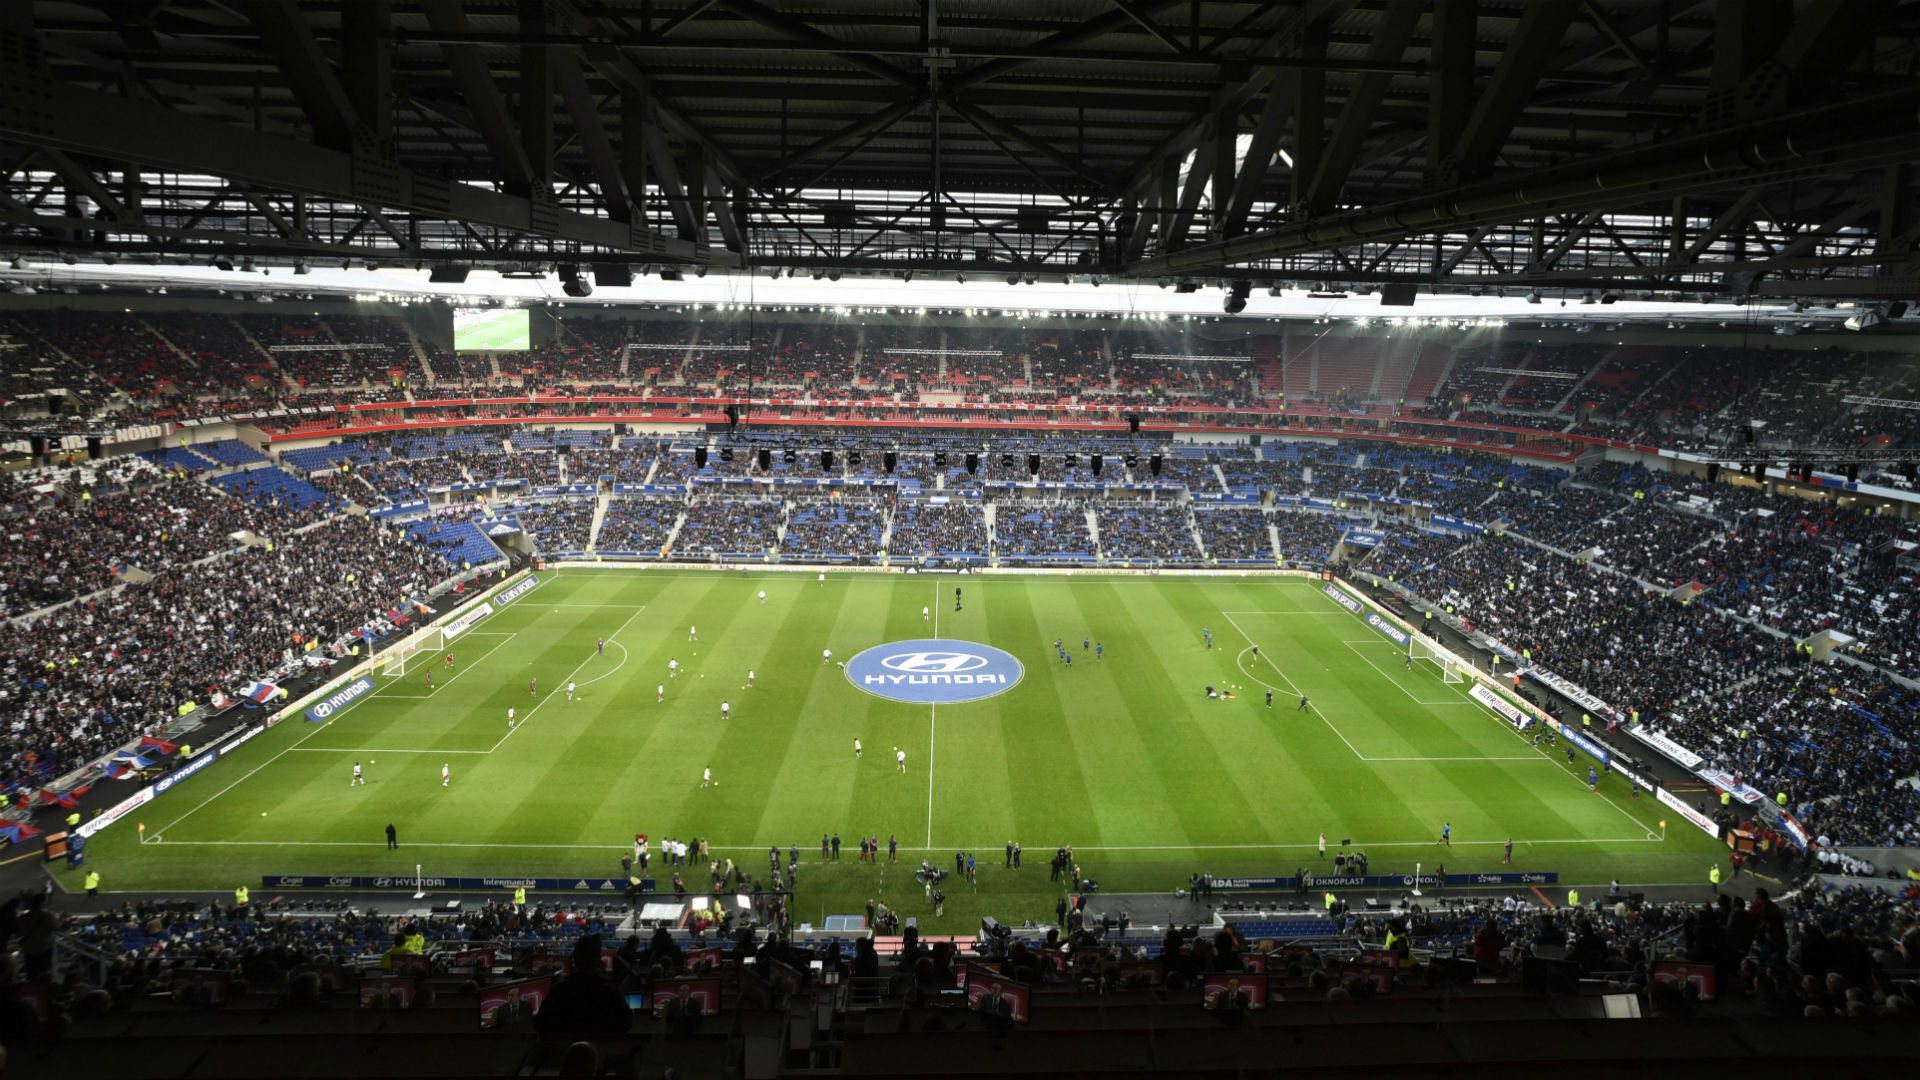 Lyon Grand Stade